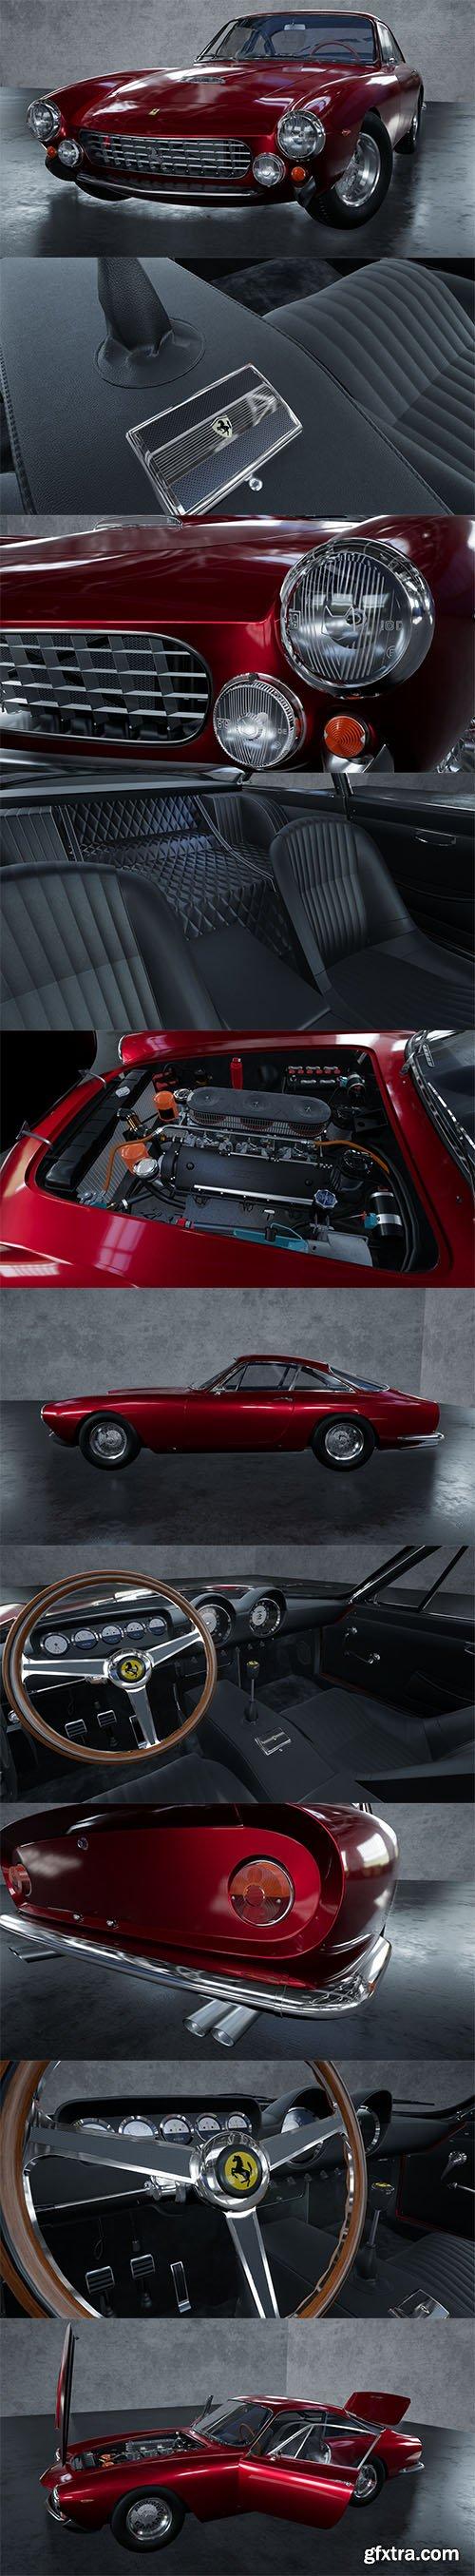 Cubebrush - 1962 Ferrari 250 GT Berlinetta Lusso